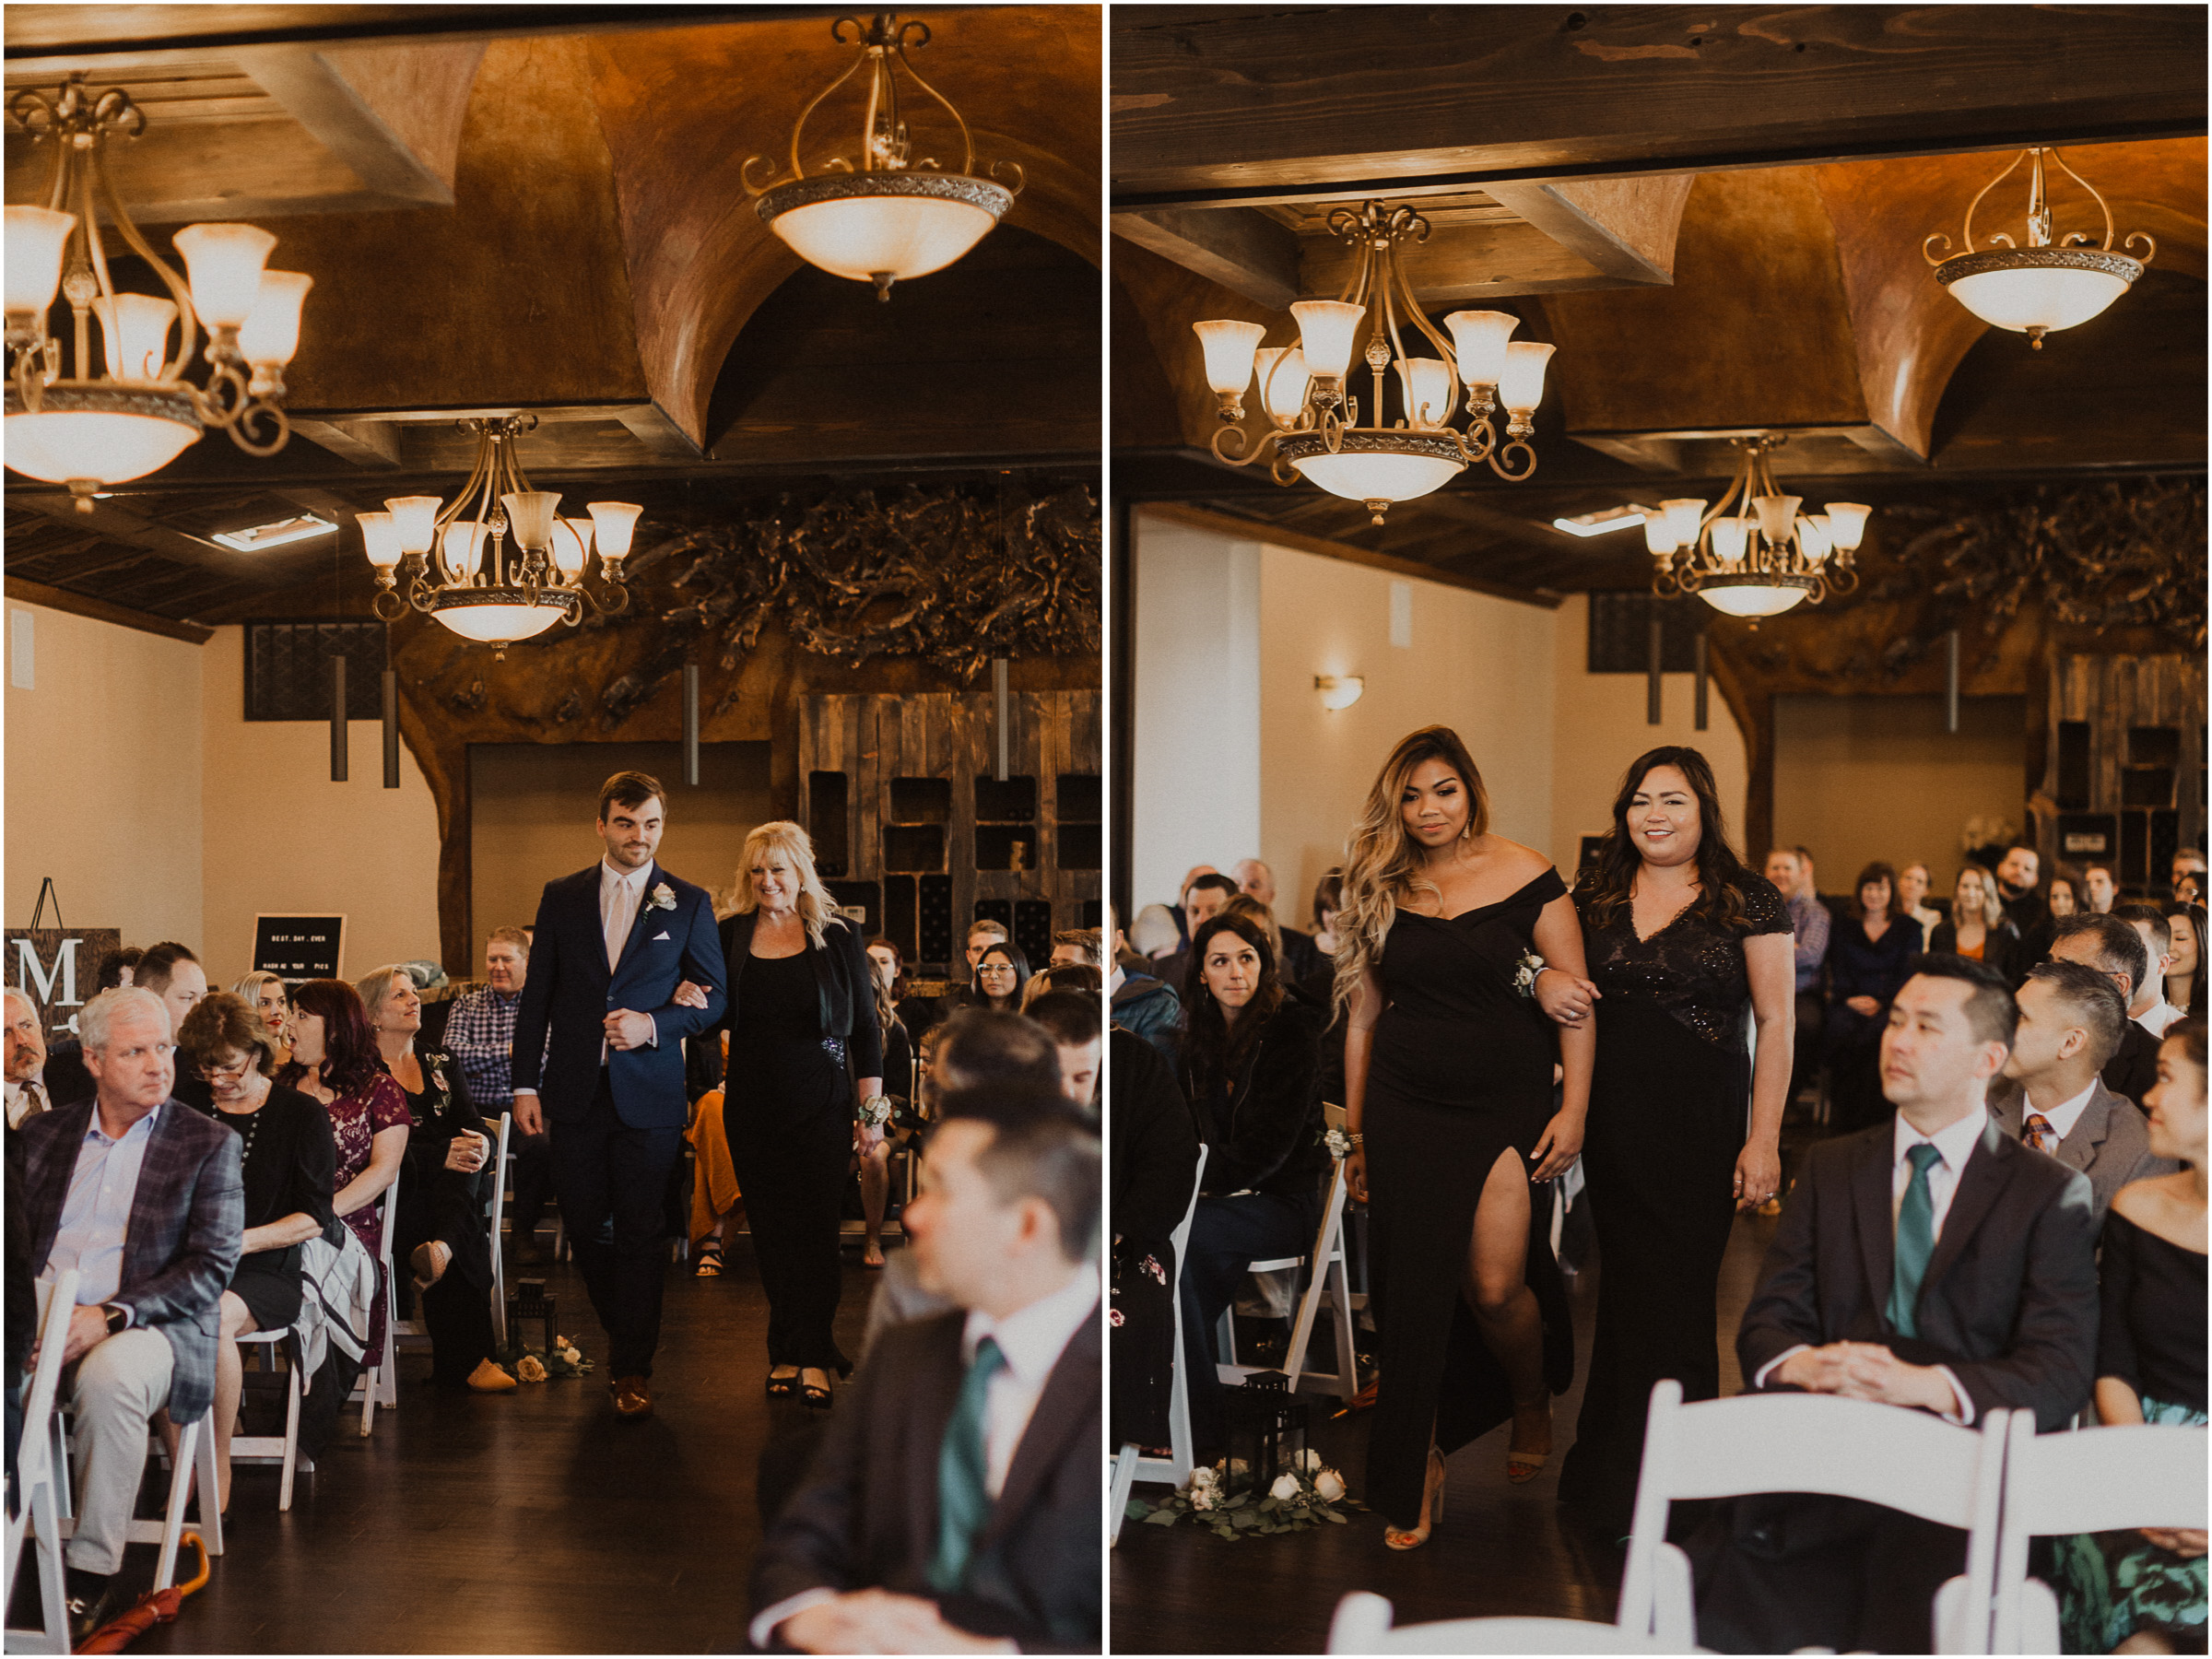 alyssa barletter photography destination wedding bay area san jose california winery photographer-44.jpg